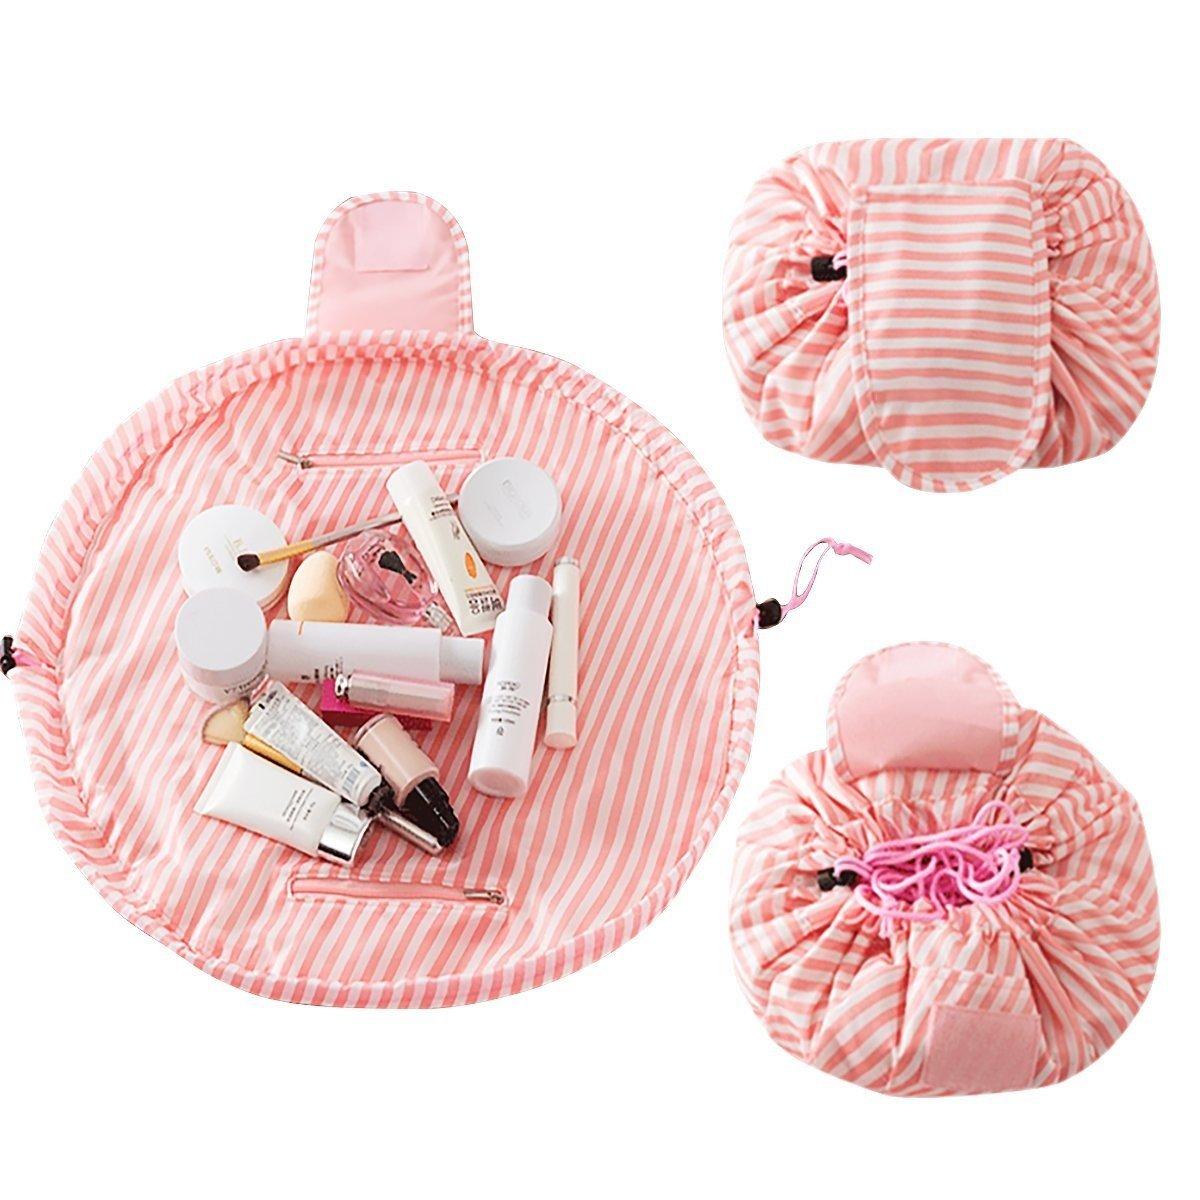 Naisidier Toiletry Bag Large Capacity Lazy Makeup Bag Portable Cosmetic Bag Multifunction Storage Portable Quick Pack Waterproof Travel Bag Drawstring Travel Organizer Storage Jewelery Cosmetic (Pink)